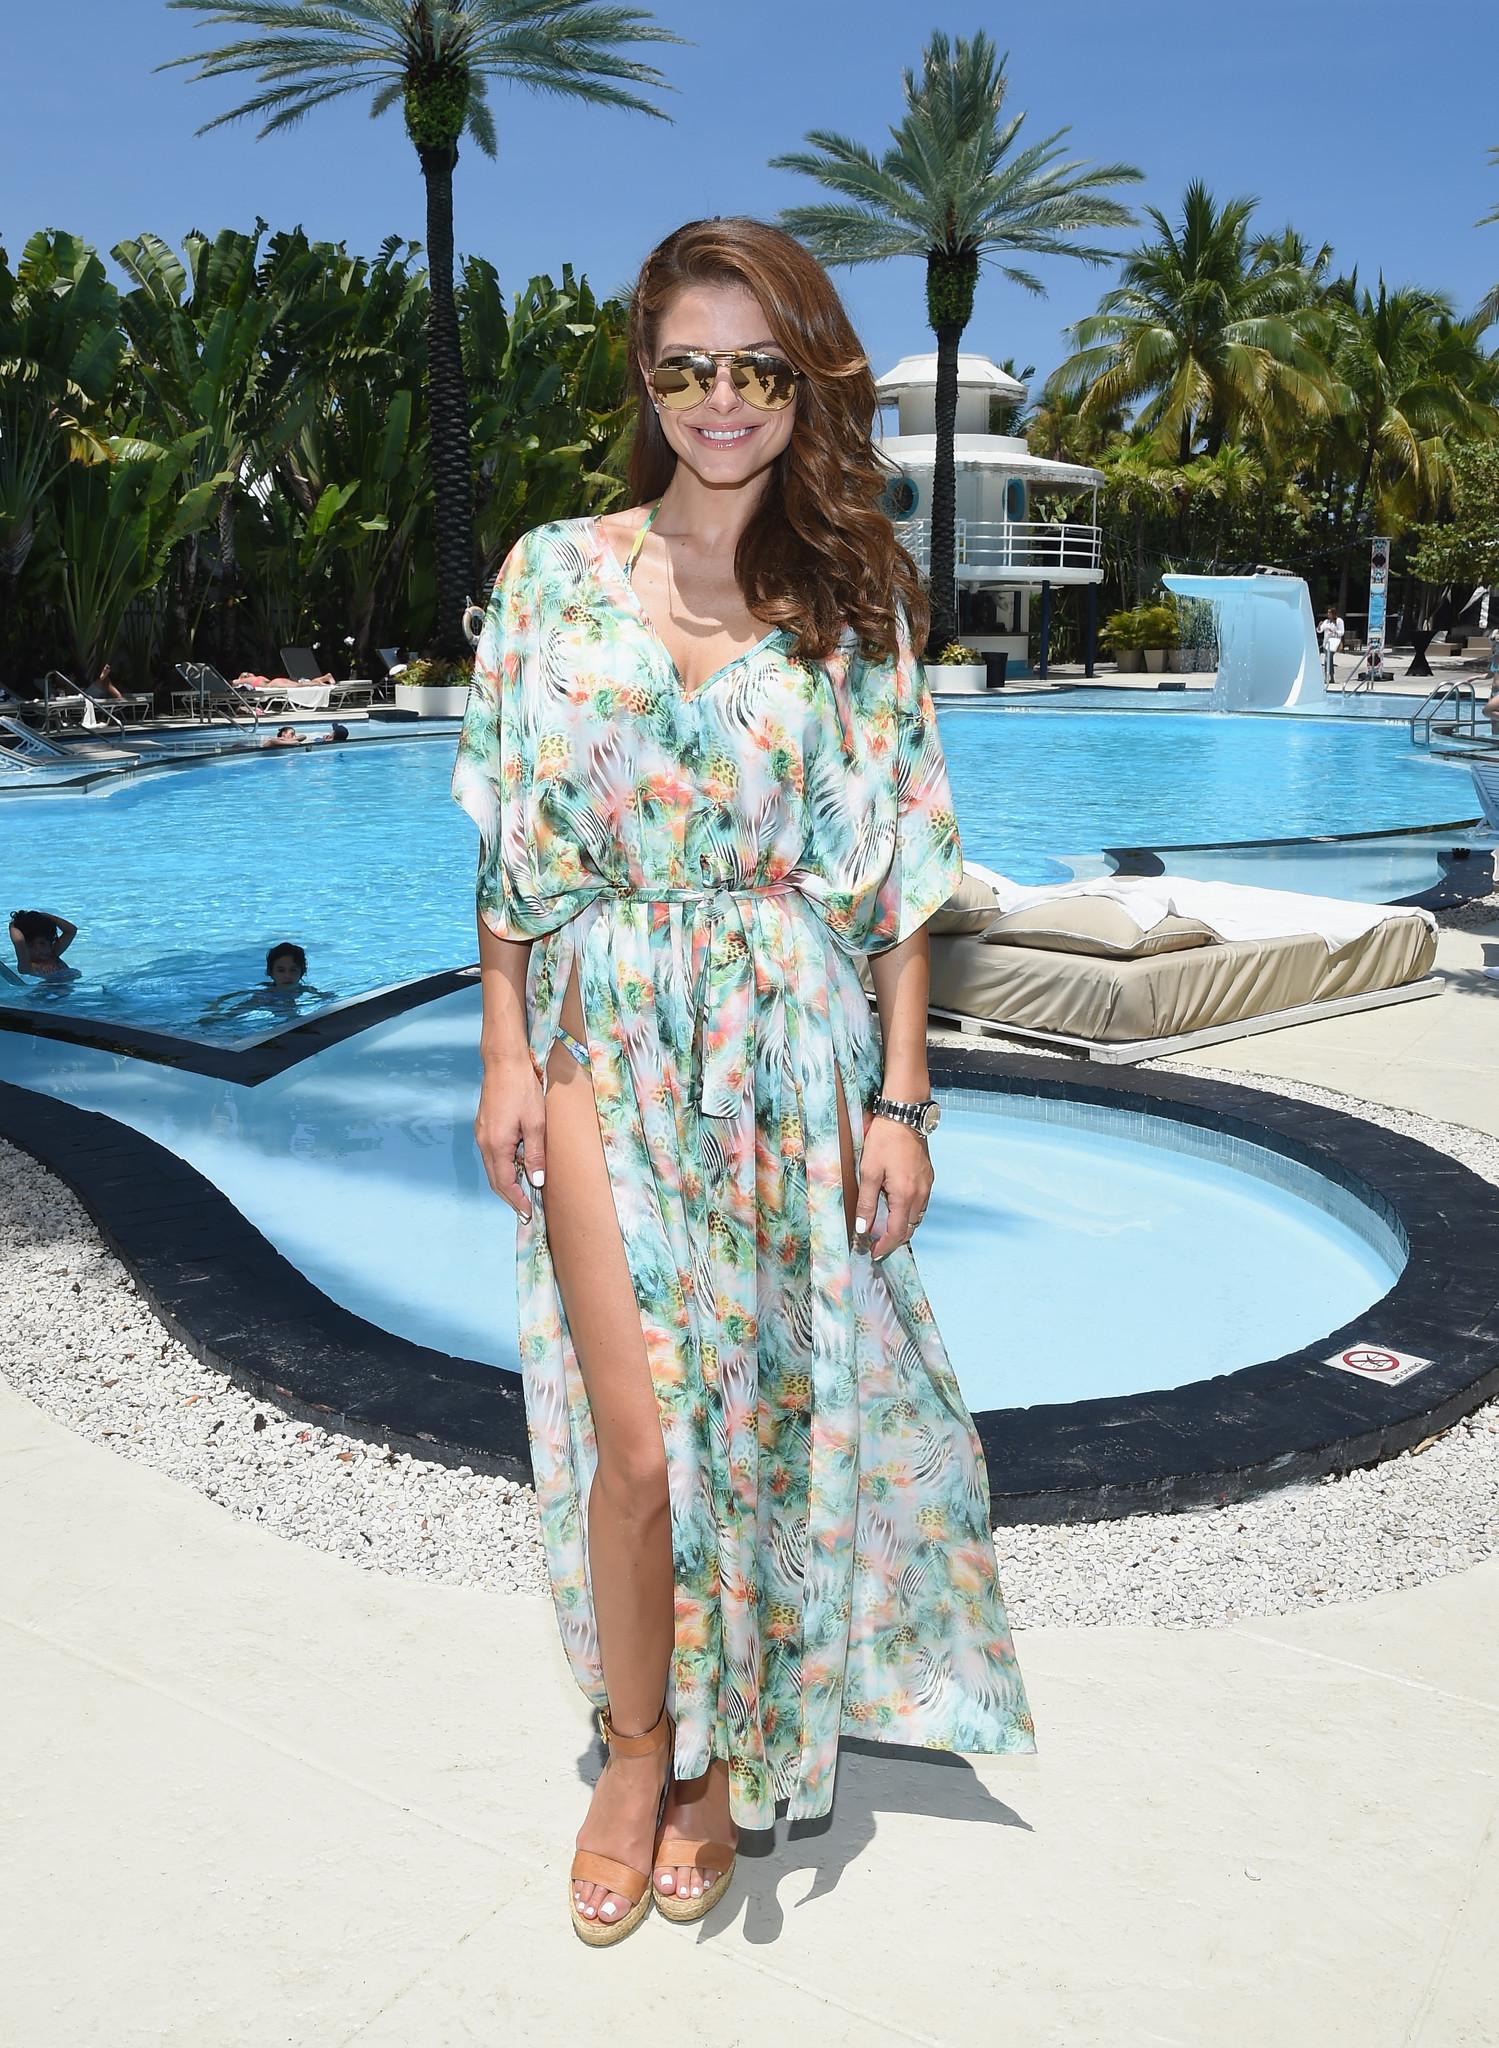 Celeb-spotting around South Florida - Mercedes-Benz Fashion Week Swim 2015 Official Coverage - Day 3